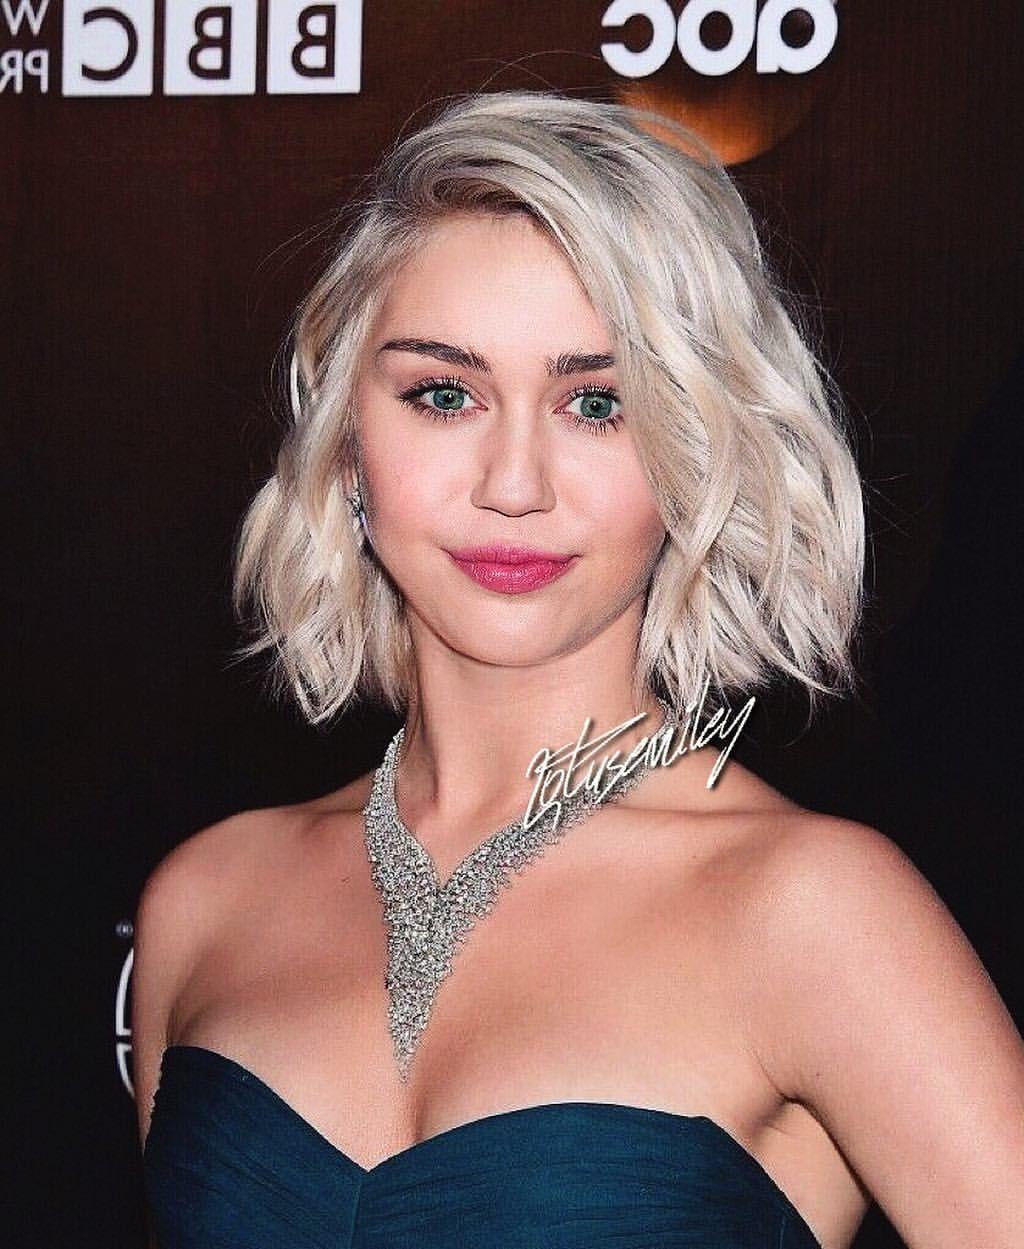 Miley Cyrus | miley cyrus | Pinterest